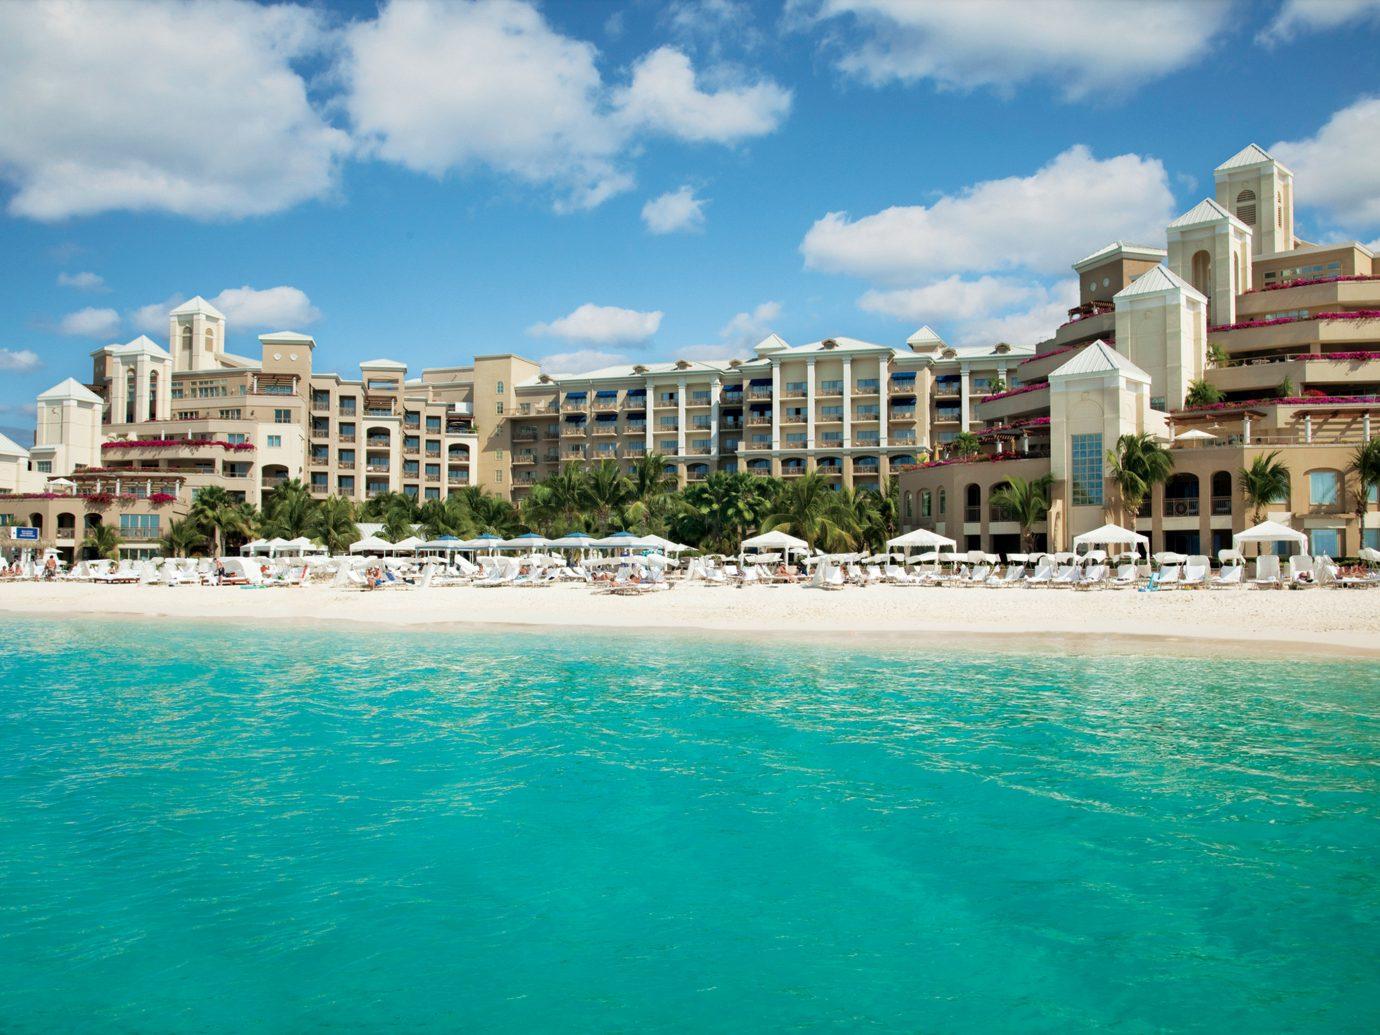 Exterior of Grand Cayman Island